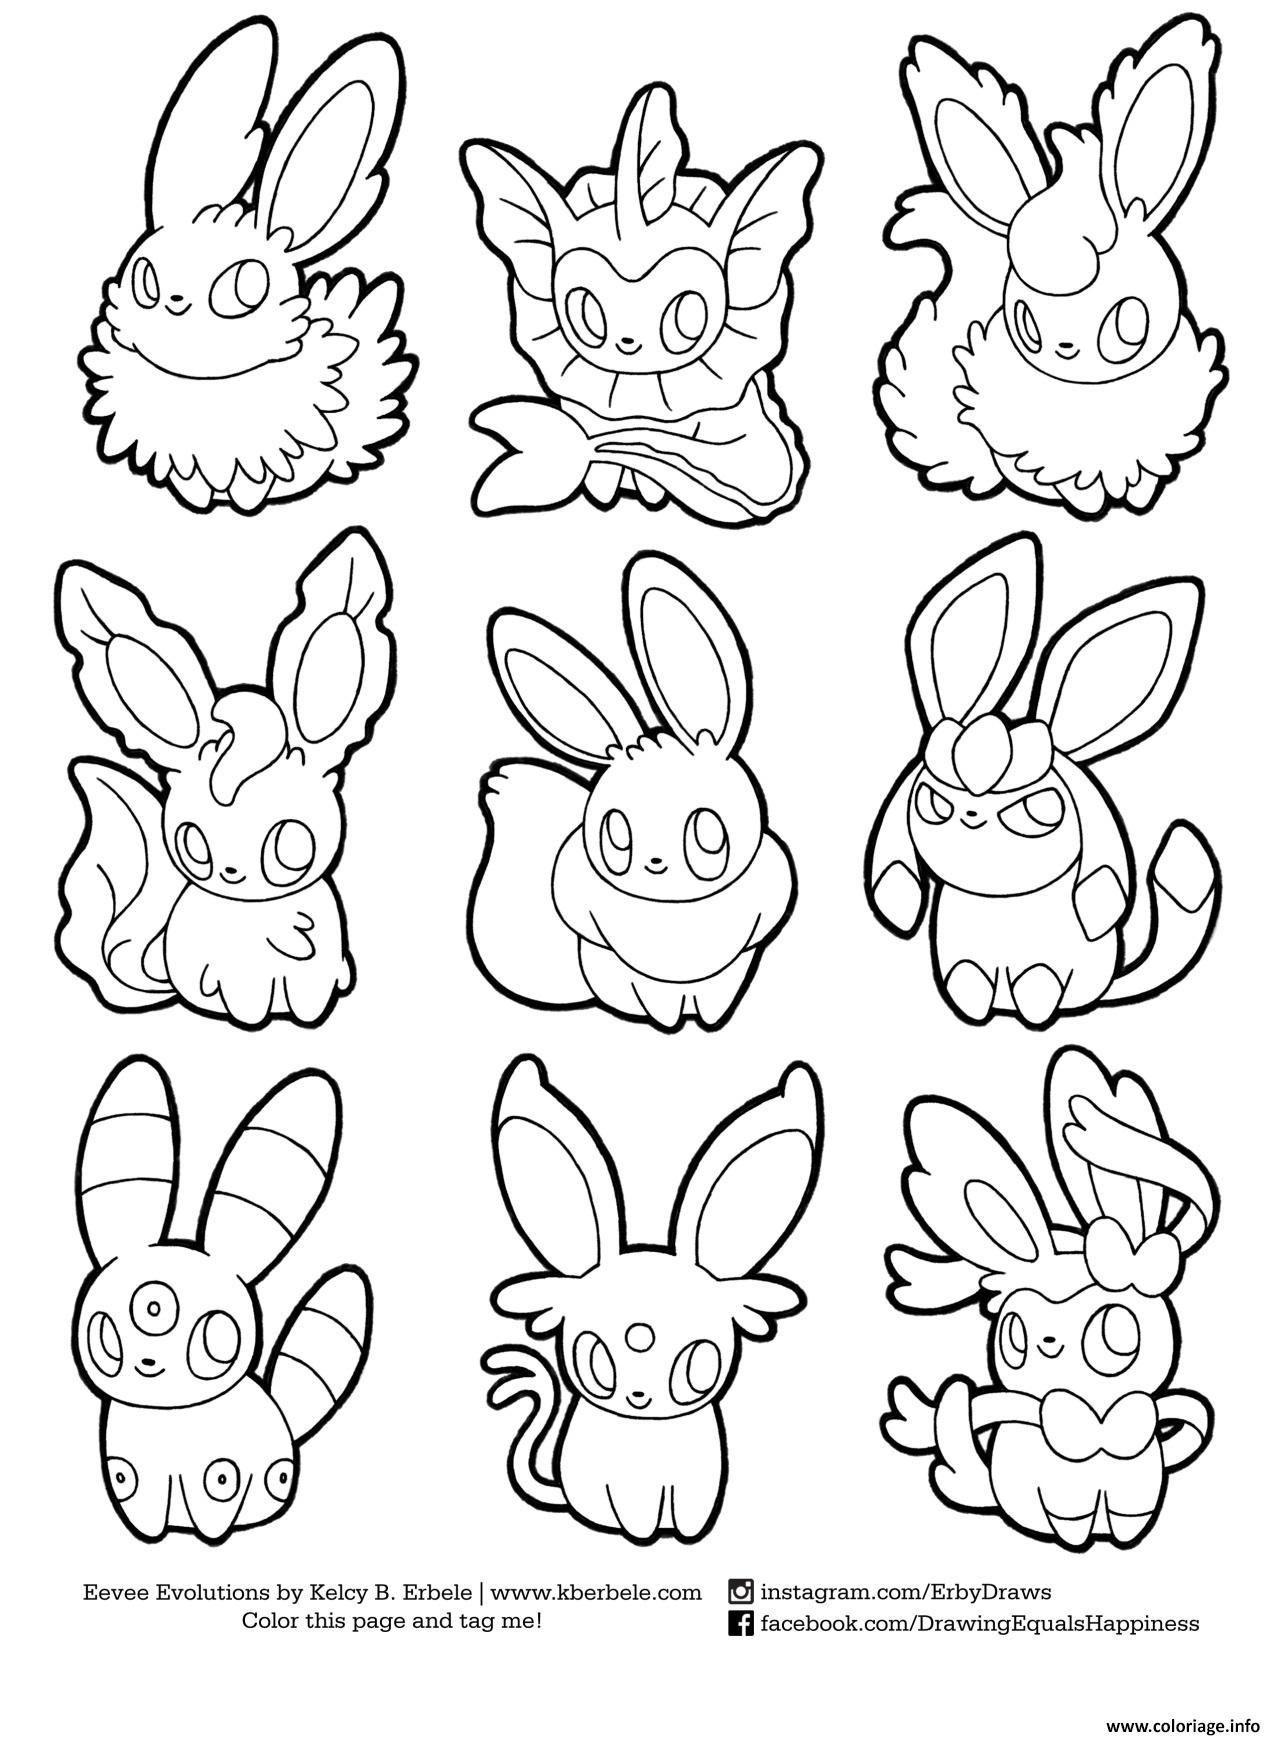 Coloriage Pokemon Eevee Evolutions List Dessin A Imprimer Coloriage Pokemon Coloriage Pokemon A Imprimer Coloriage A Imprimer Gratuit